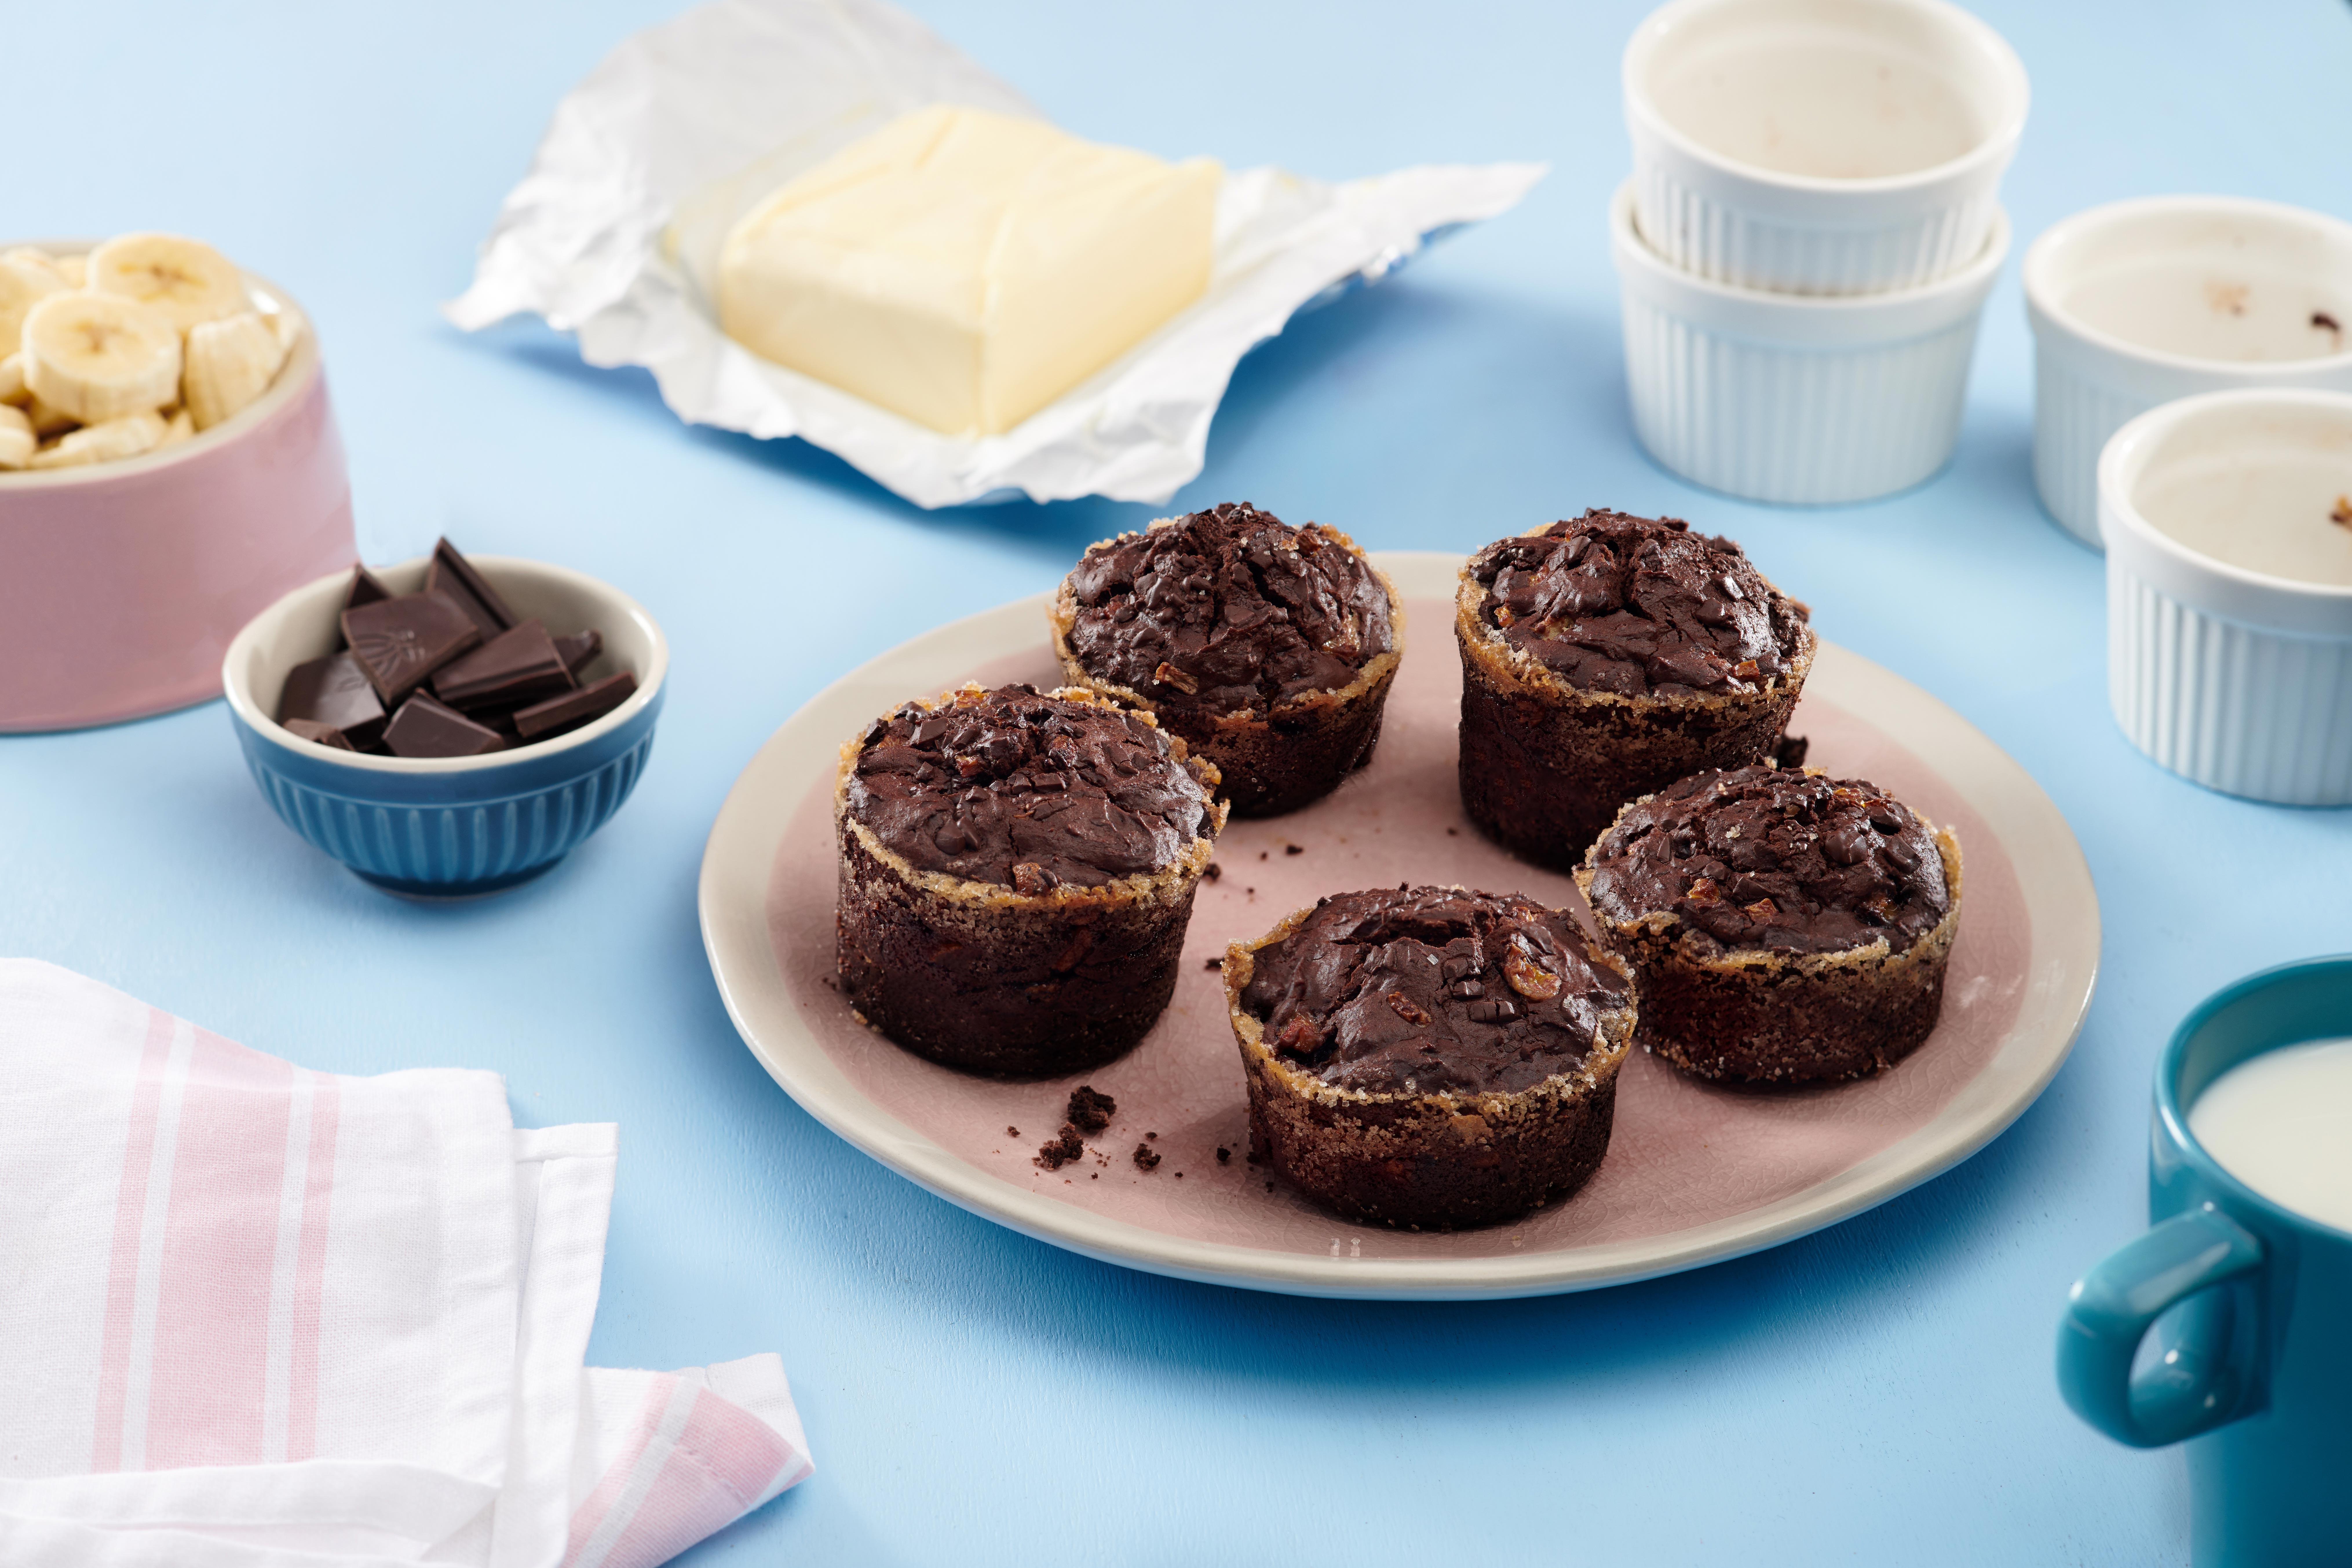 8bad3877d0c61 Čokoládové muffiny rebelky Karolíny | Hello Tesco